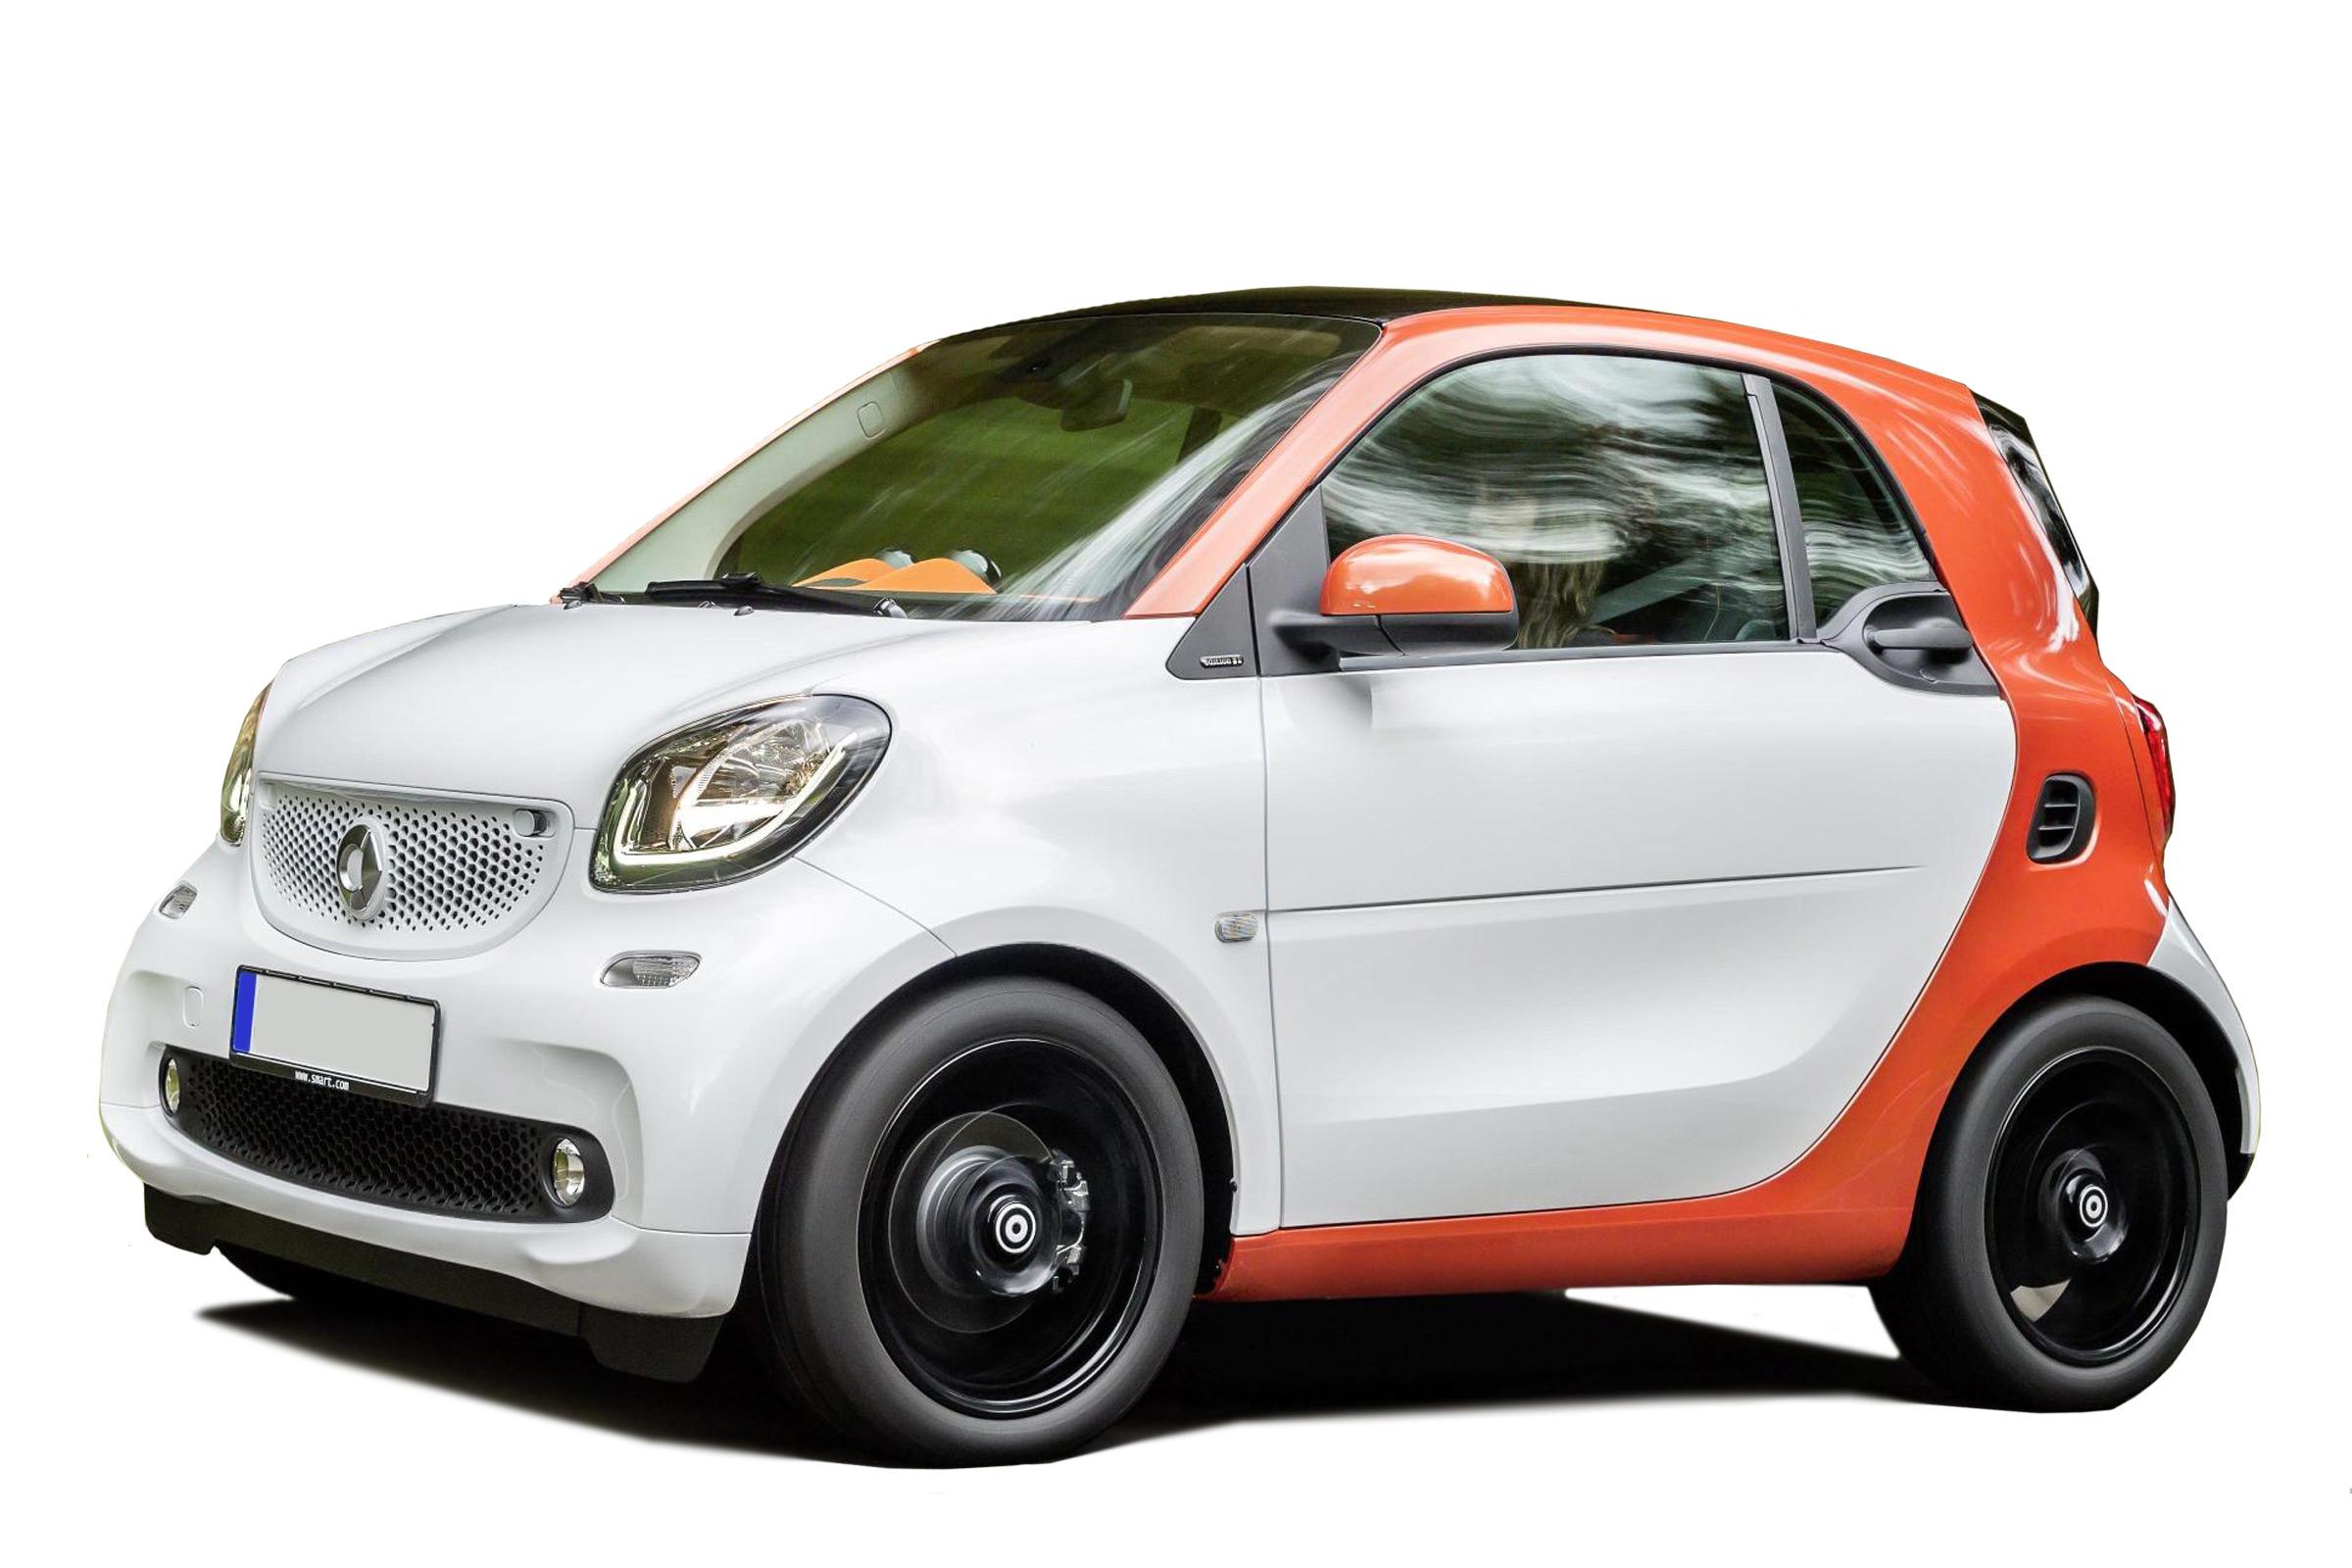 smart-fortwo-microcar-cutout.jpg